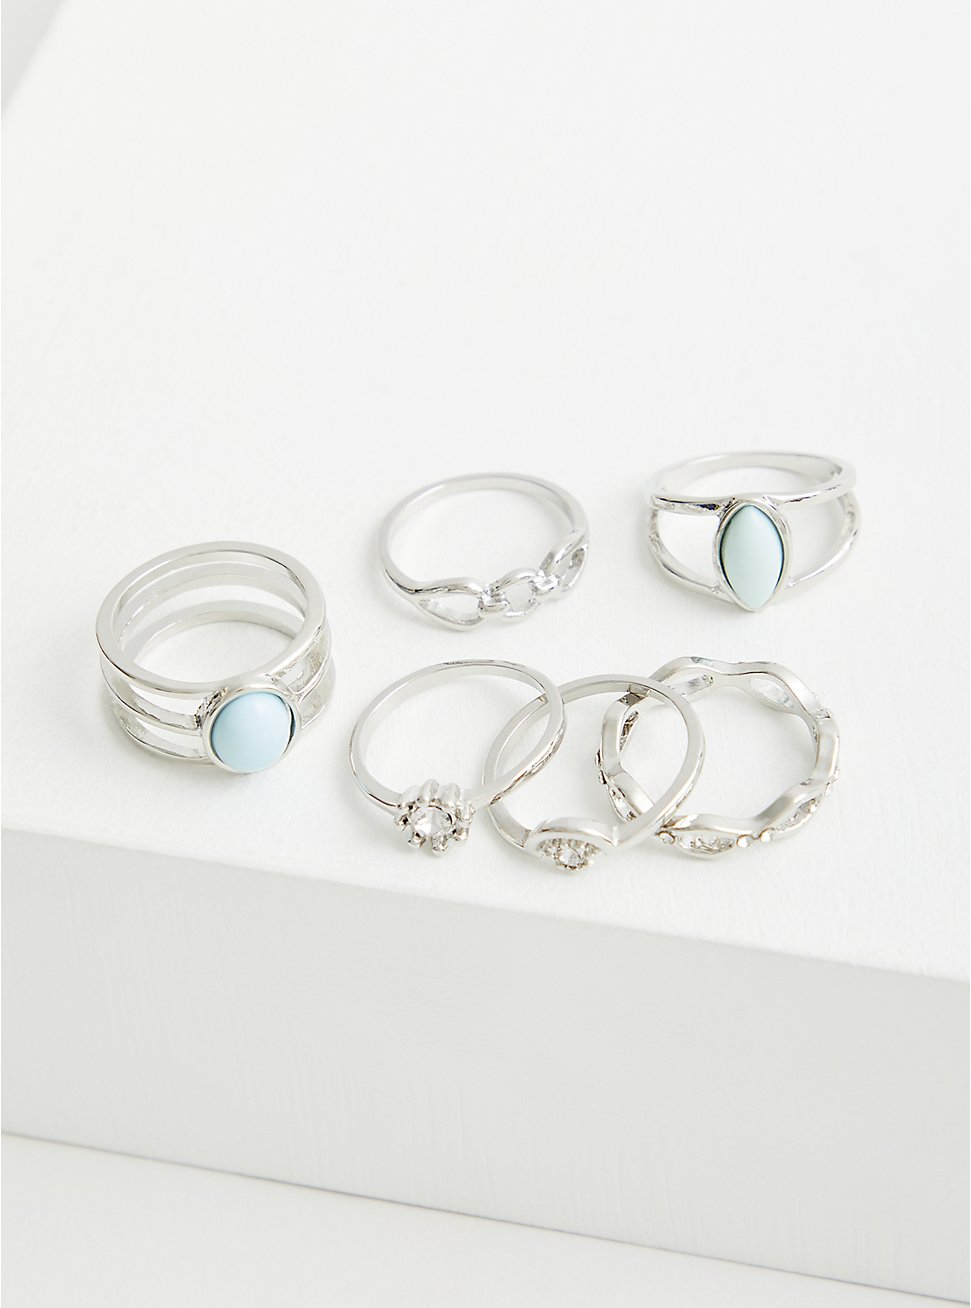 Silver Tone Oxidized Grey Stone Ring Set - Set of 6, SILVER, hi-res